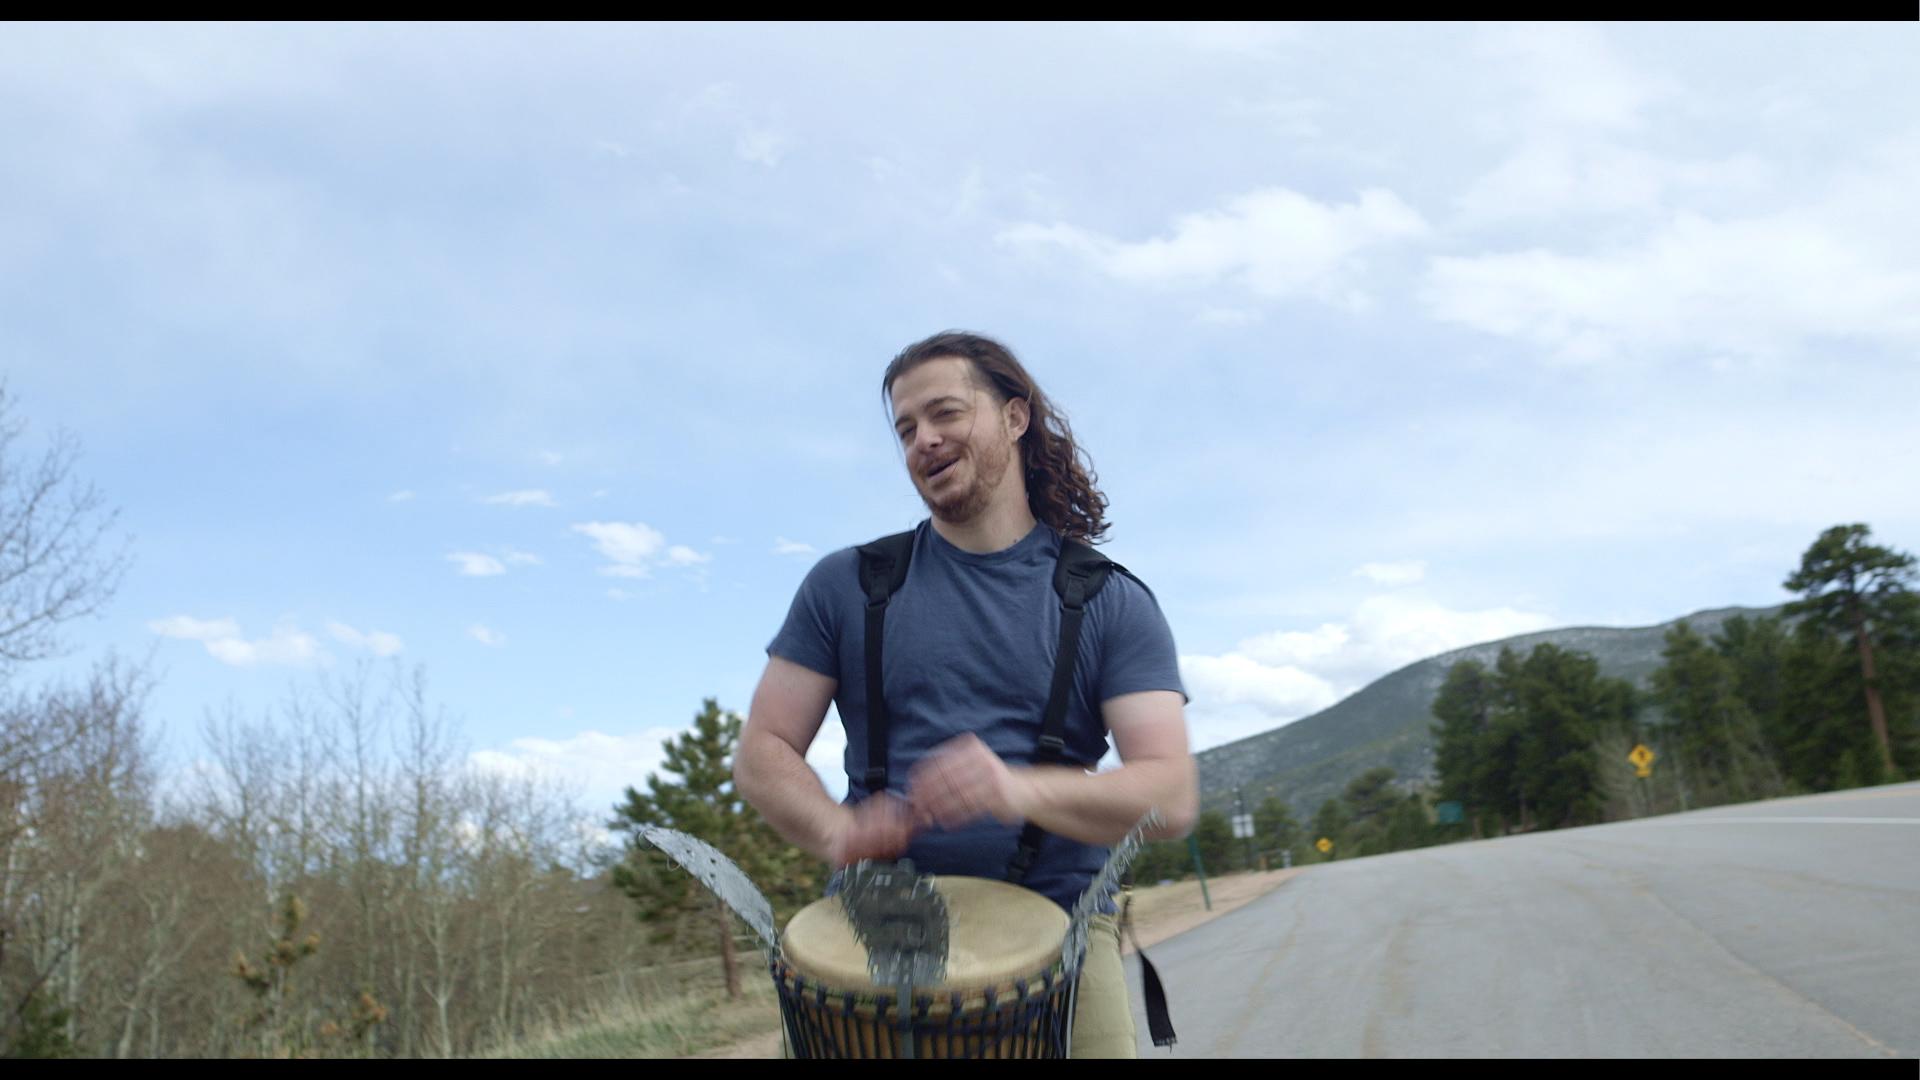 Highway-drumming